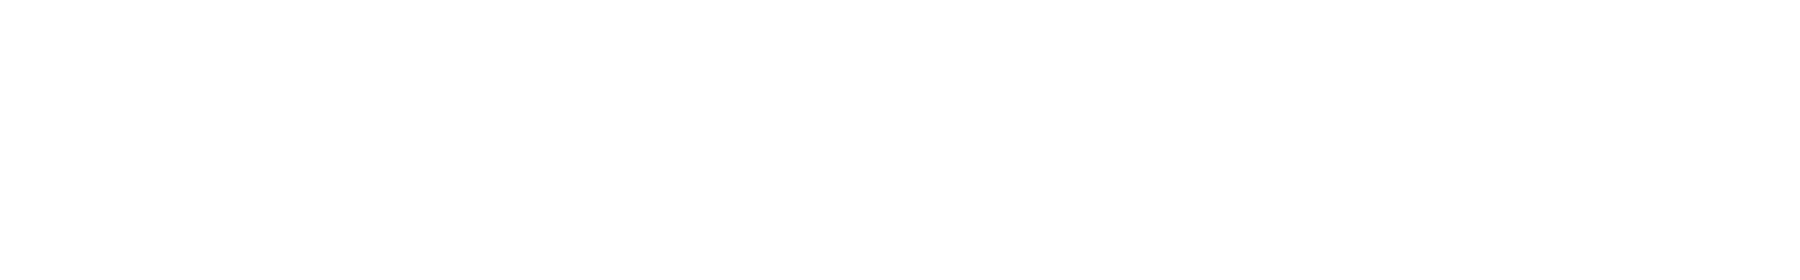 vedh melodyloop 095 fm7 g d c 124 bpm